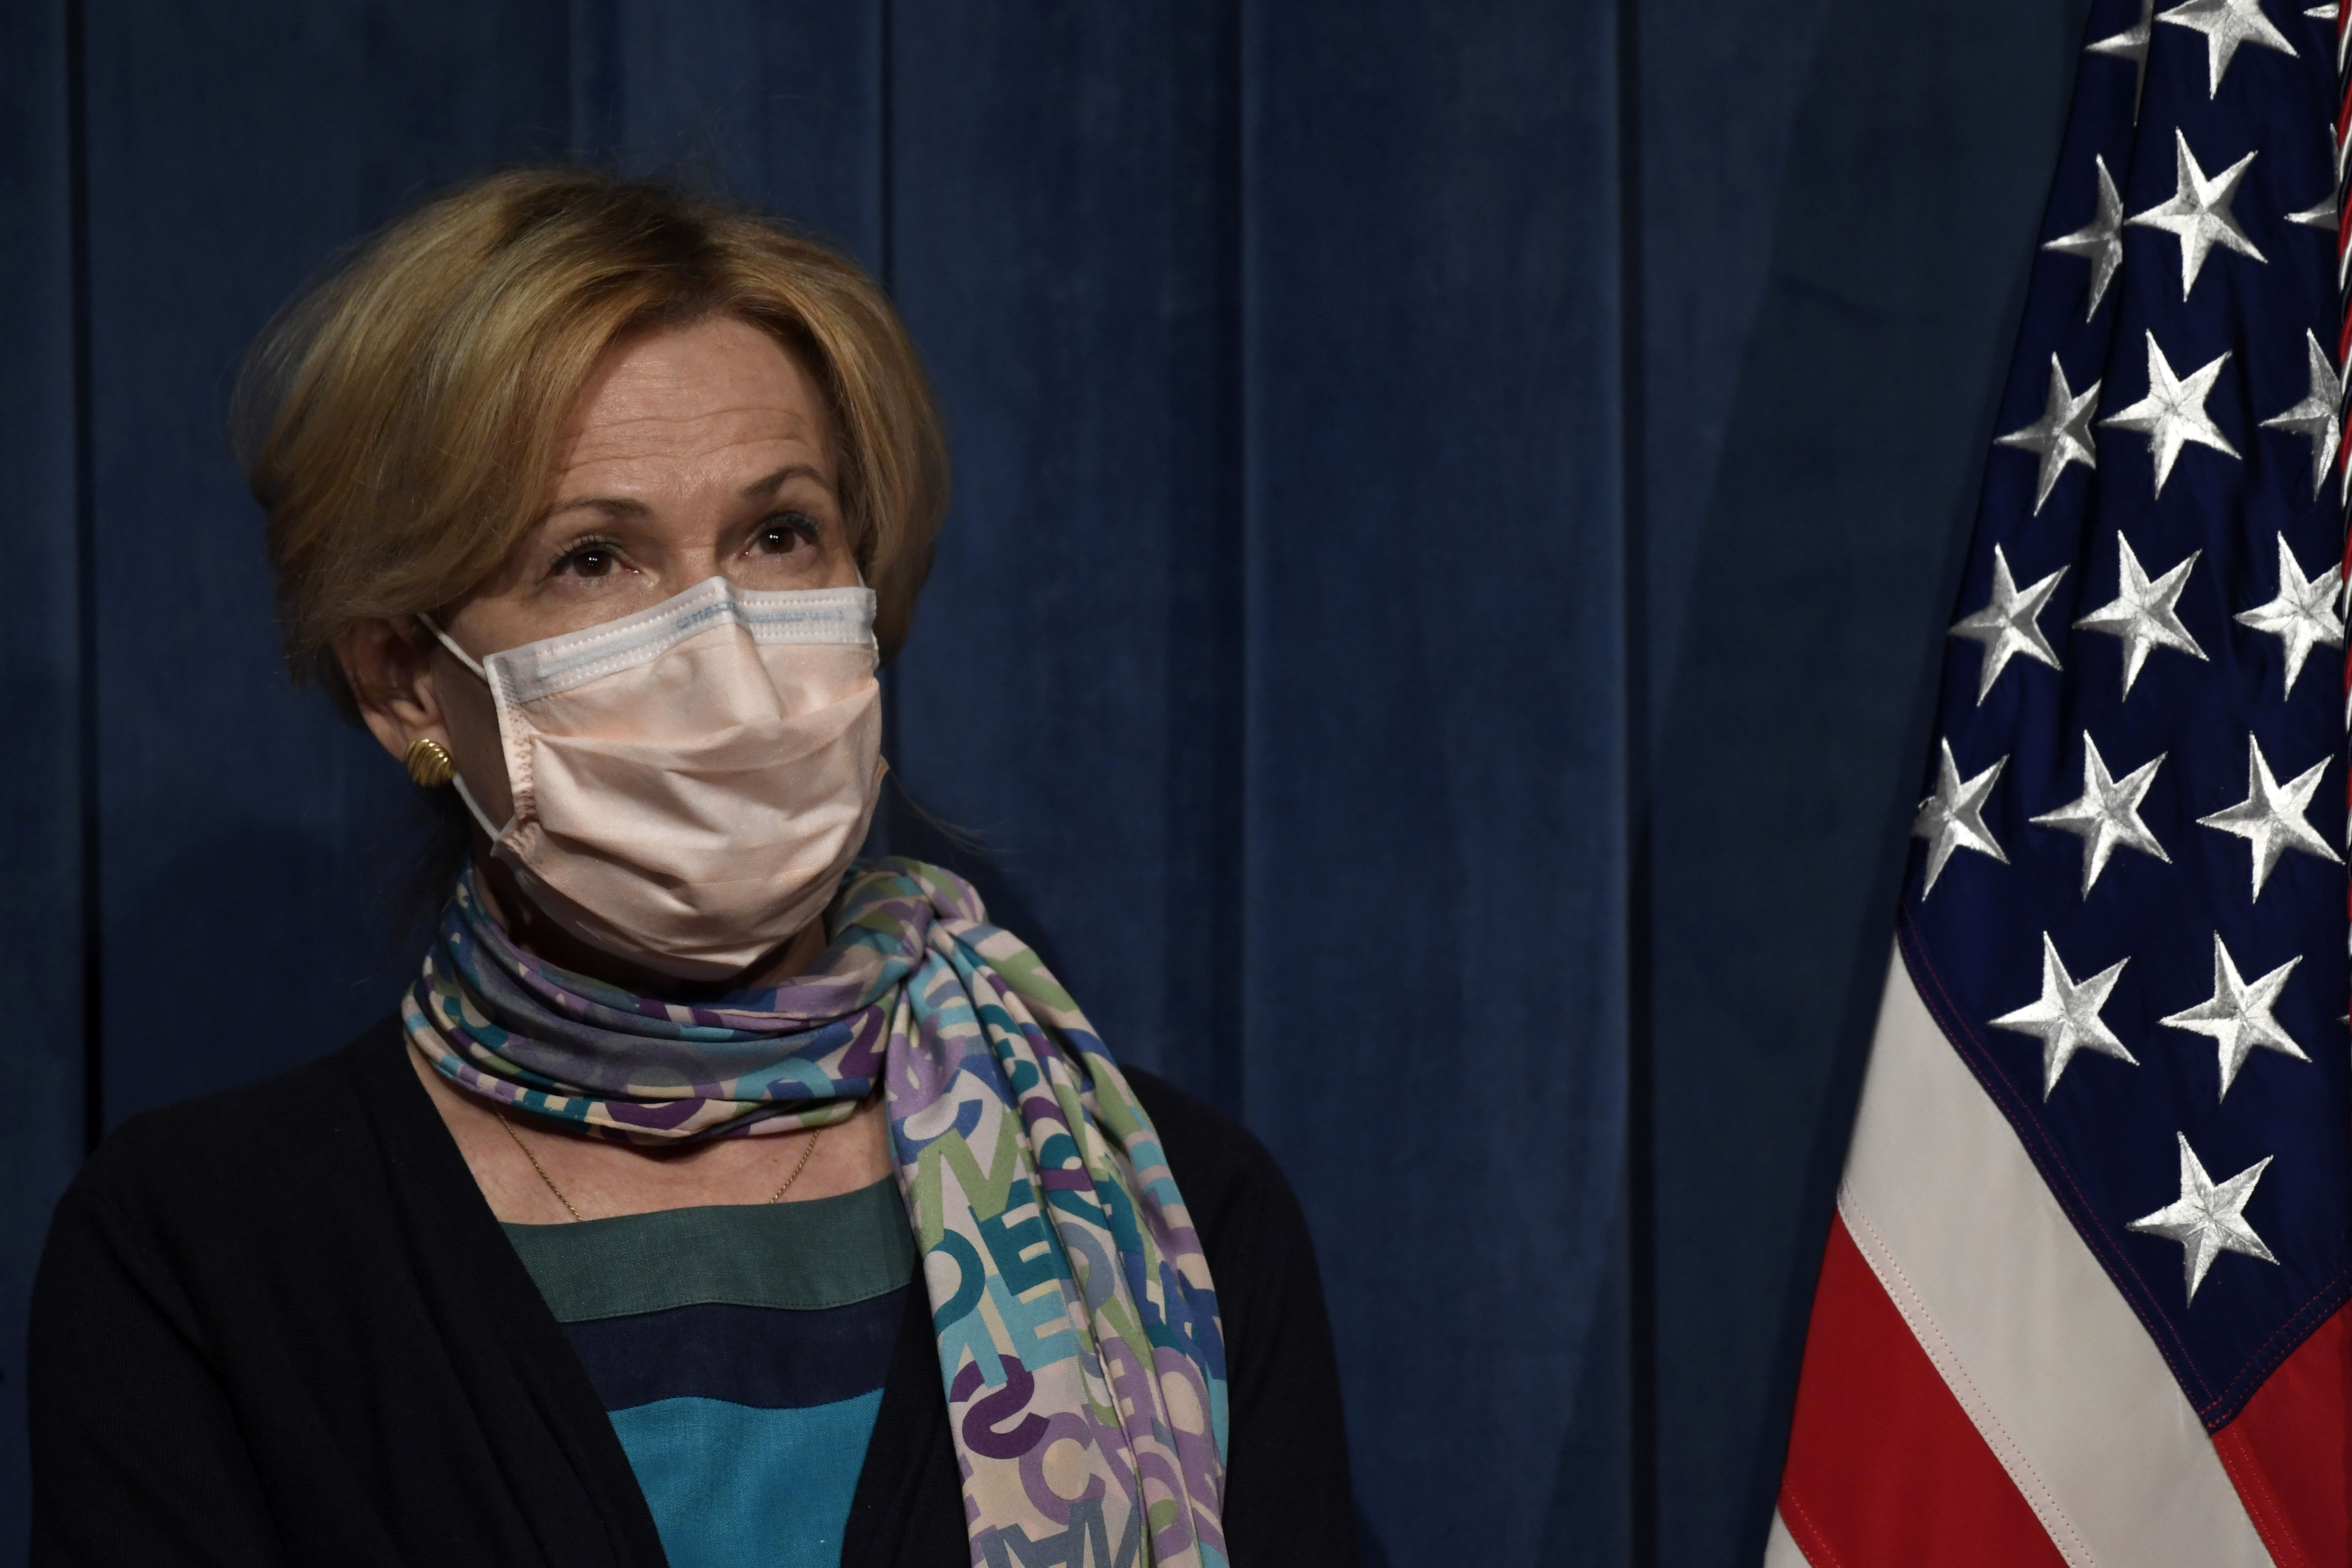 Dr. Deborah Birx, the White House coronavirus task force coordinator, listens during a coronavirus briefing in Washington, DC, on June 26.